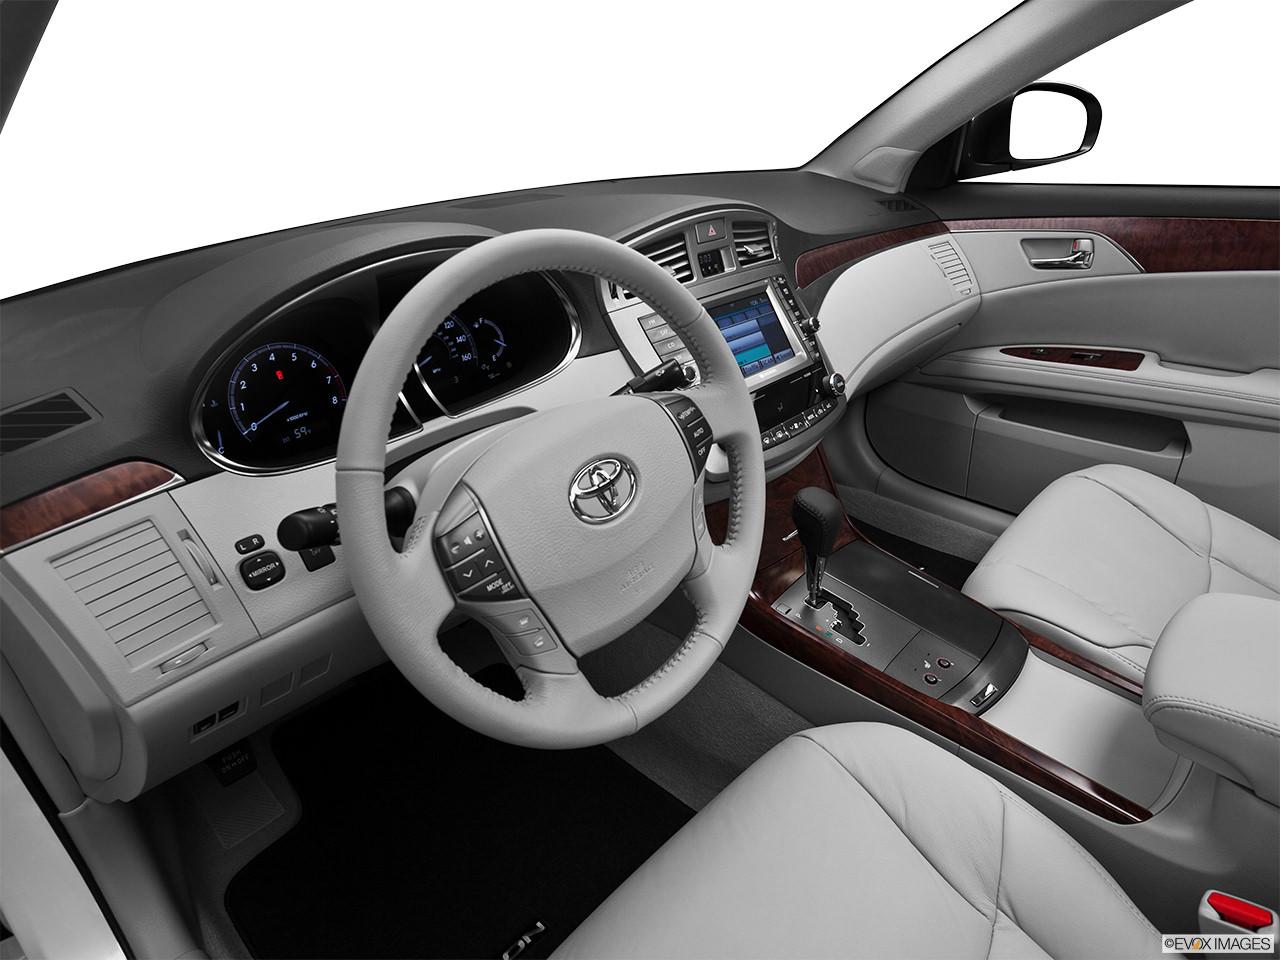 Toyota Avalon 2012 Interior